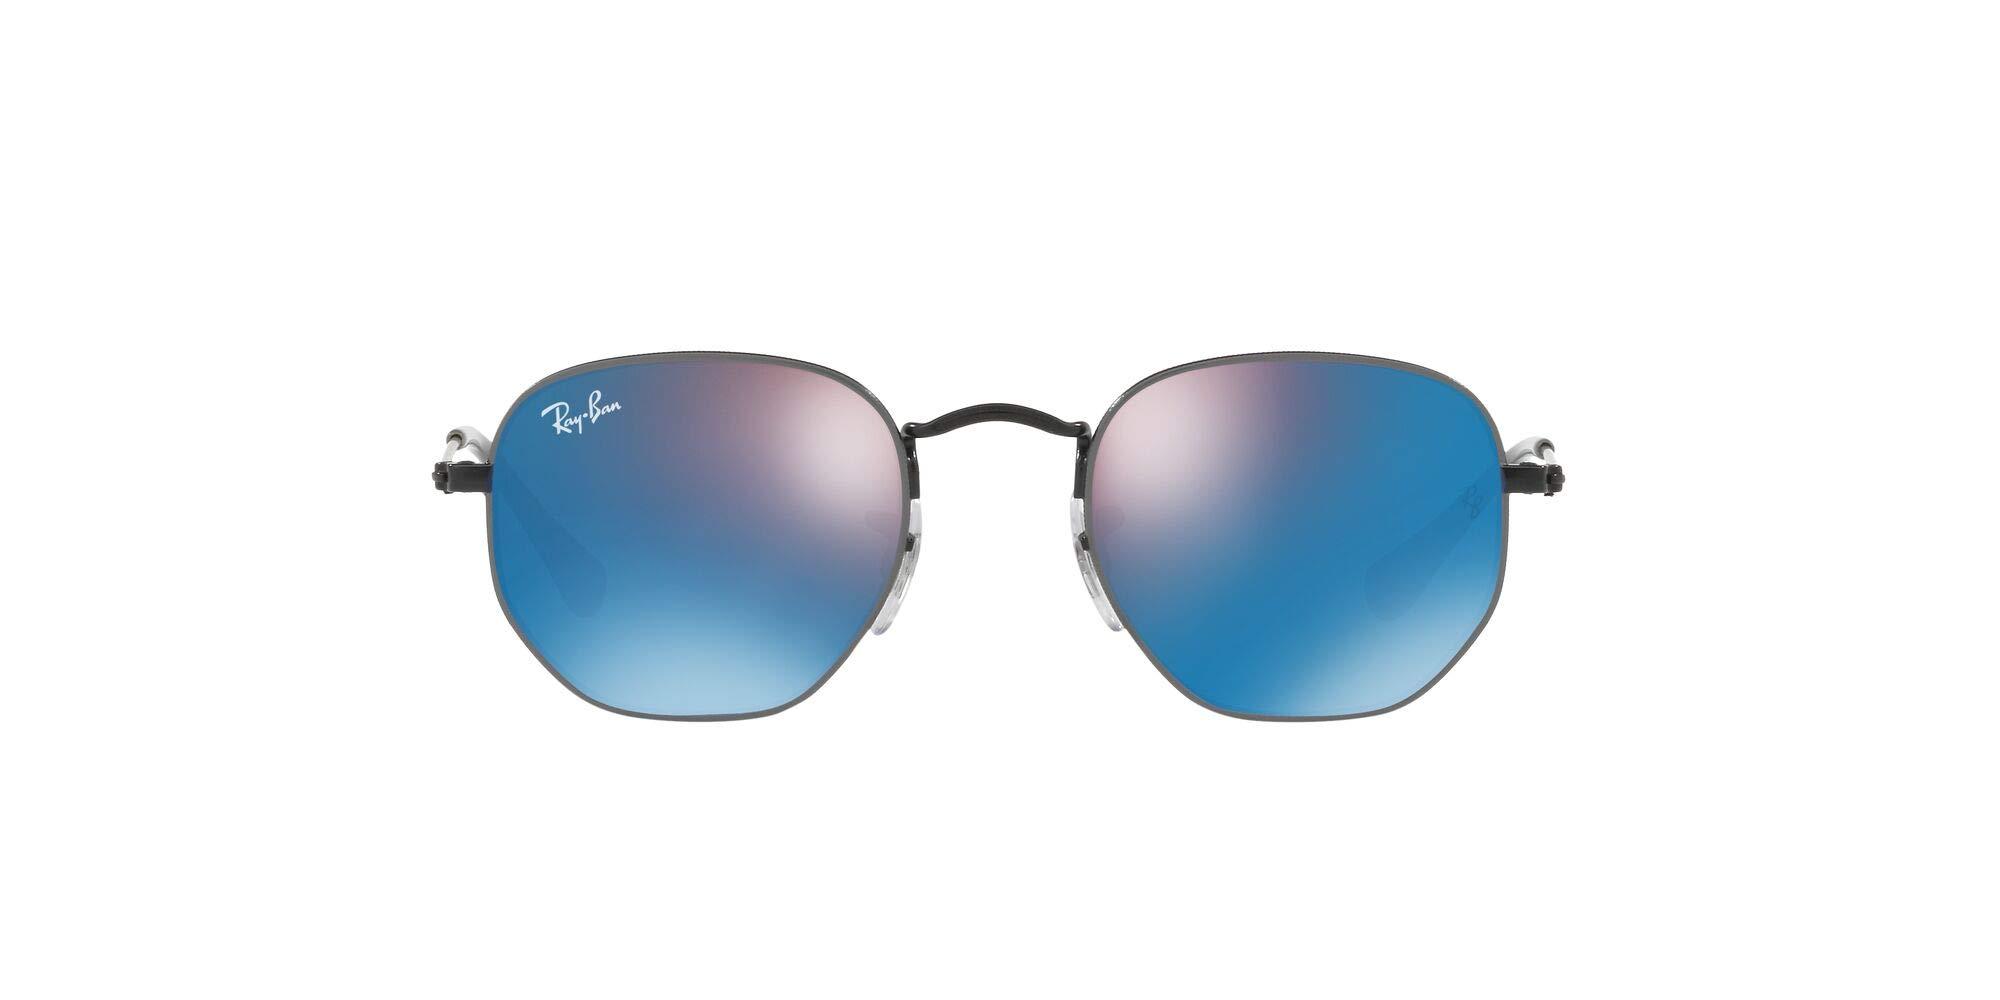 Ray-Ban Kids' Rj9541sn Hexagonal Sunglasses Square